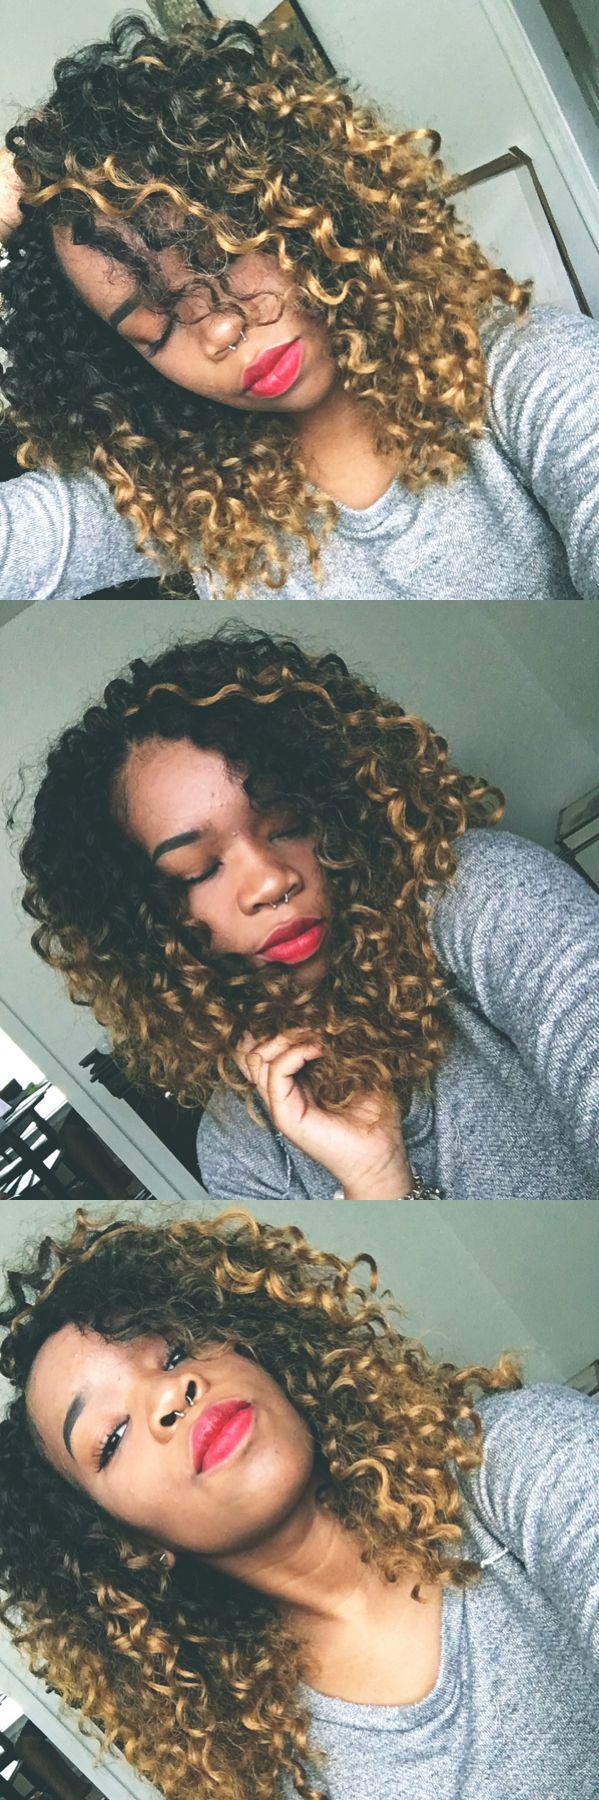 Does crochet braid damage hair fastest - Blonde Ombre Curly Crochet Braids I Used Freetress Barbadian Braid